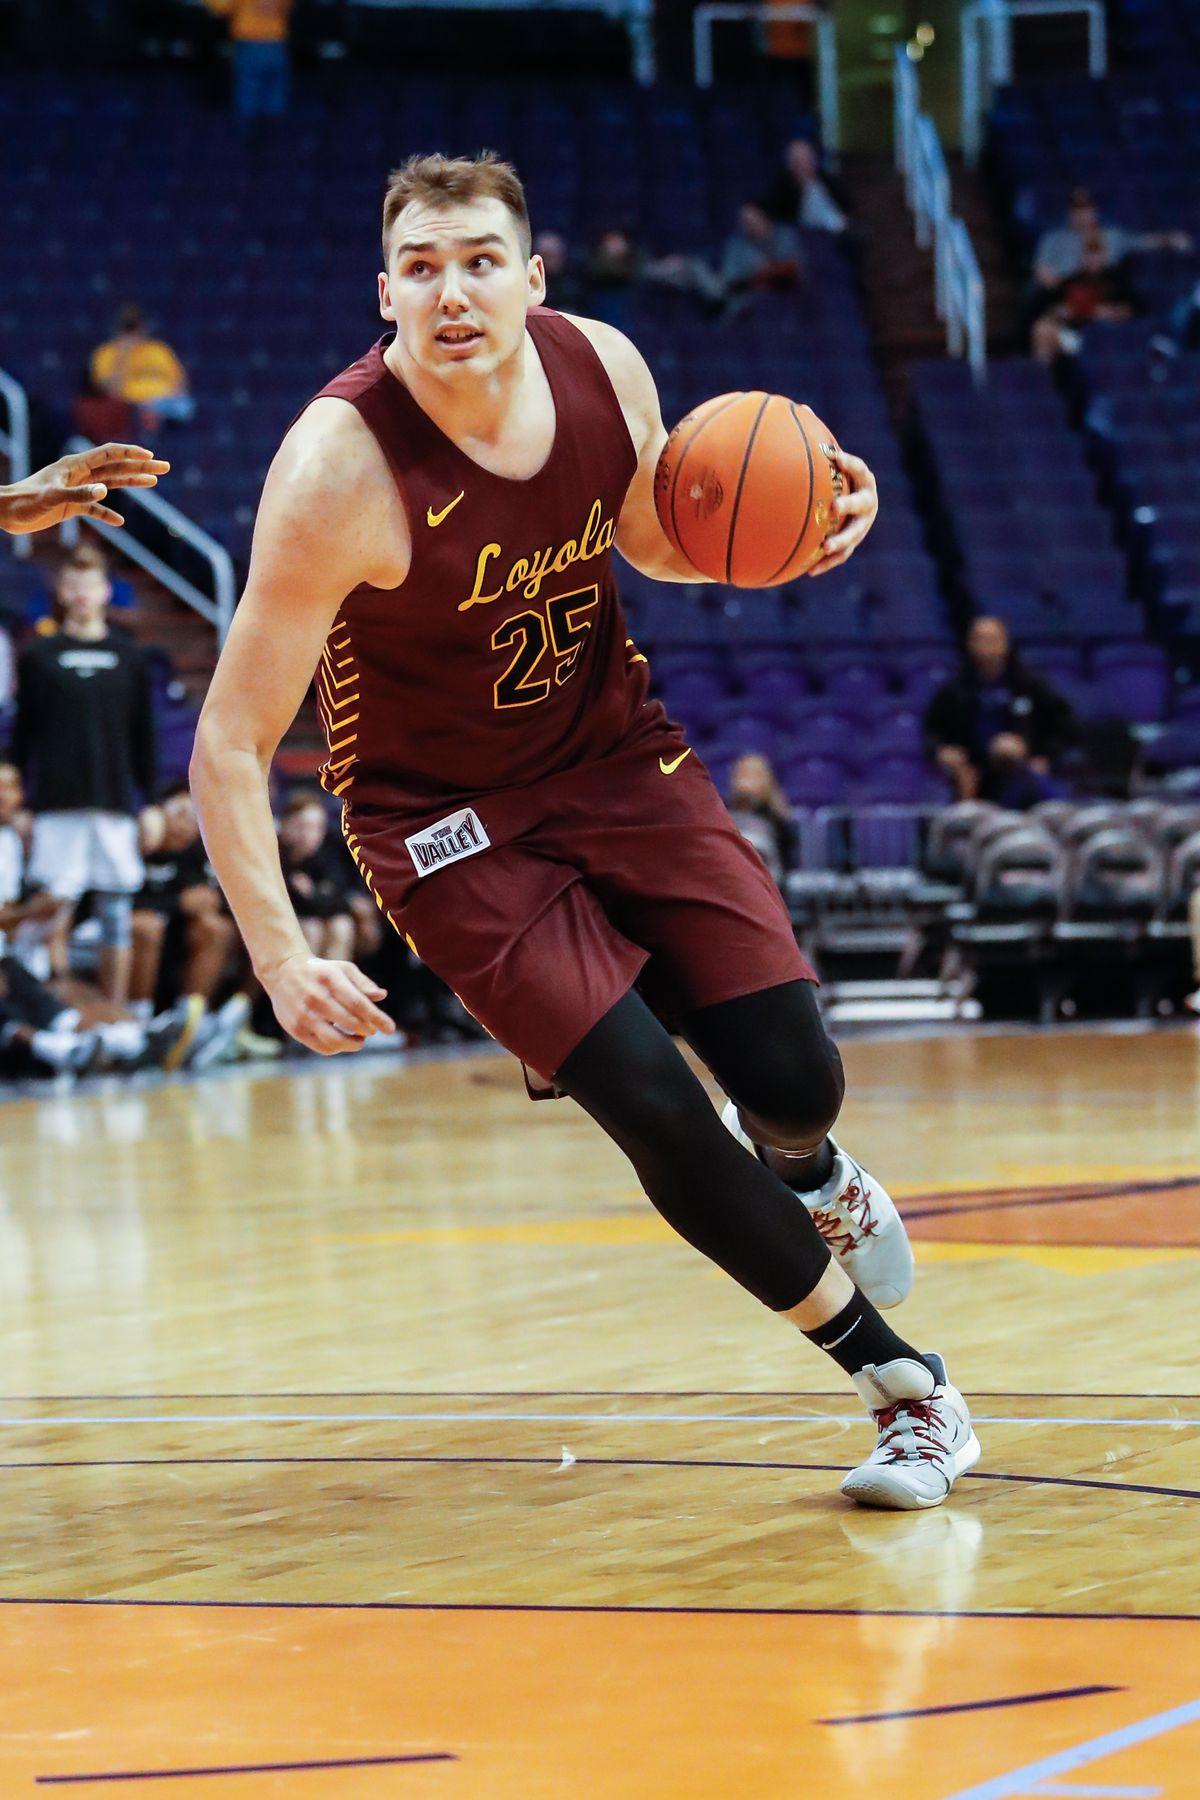 COLLEGE BASKETBALL: DEC 18 Basketball Hall of Fame Showcase - Vanderbilt v Loyola Chicago